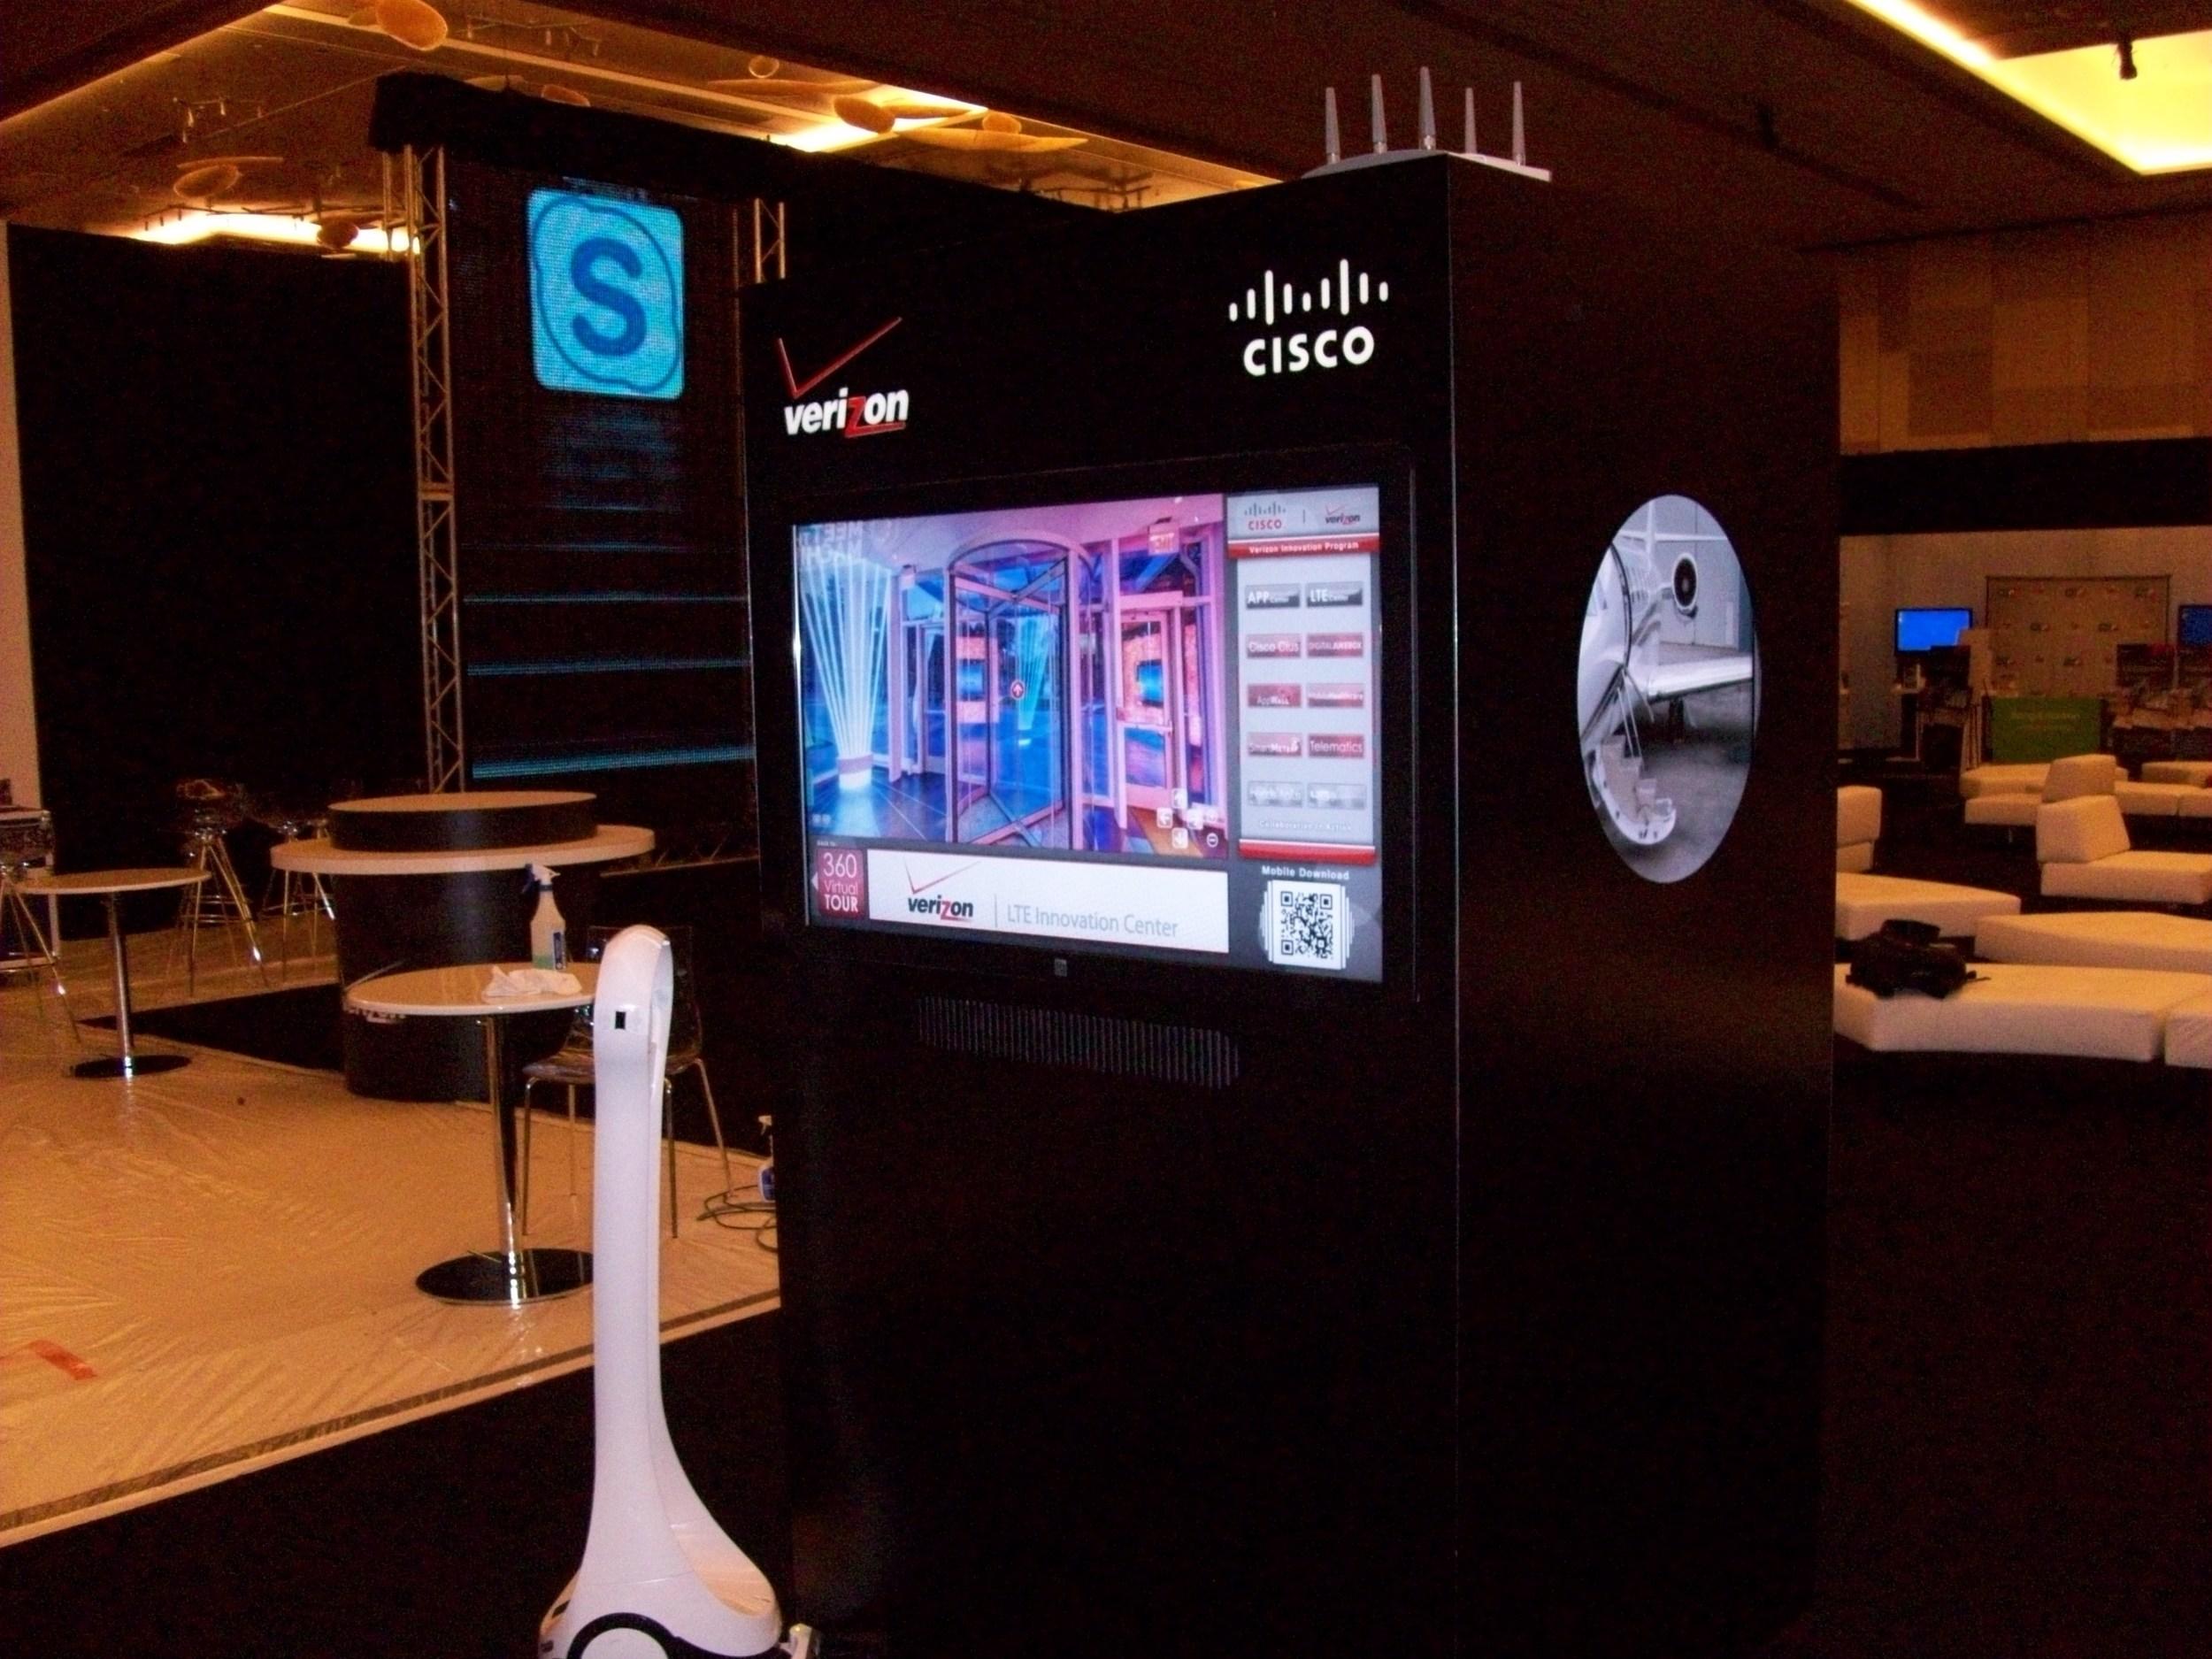 Verizon/ Cisco Systems